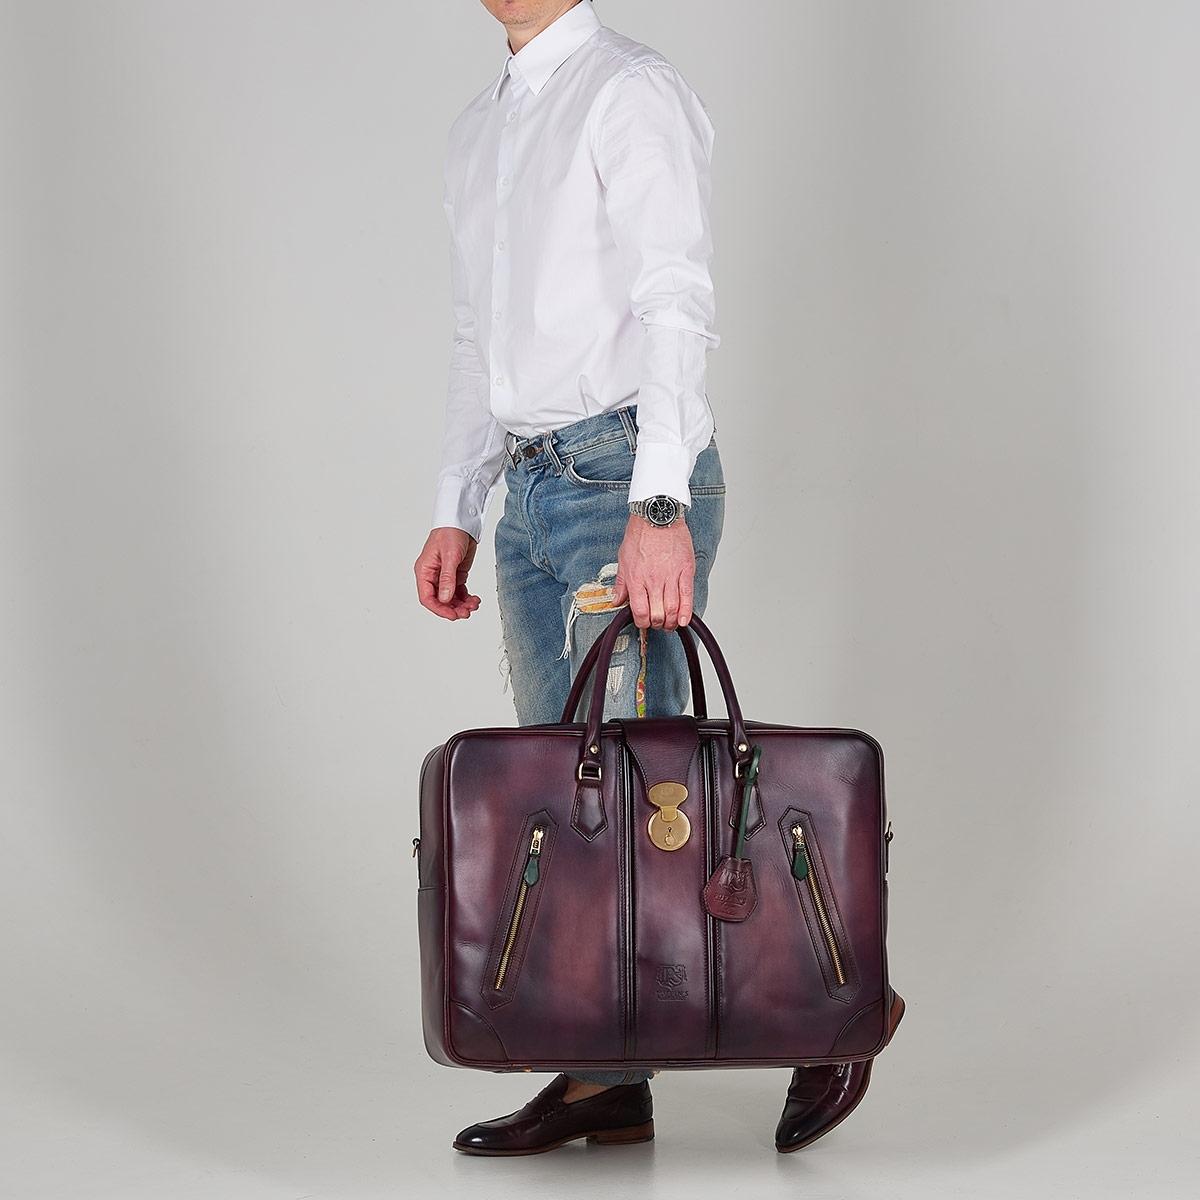 Leather suitcase HOLIDAY plum wine